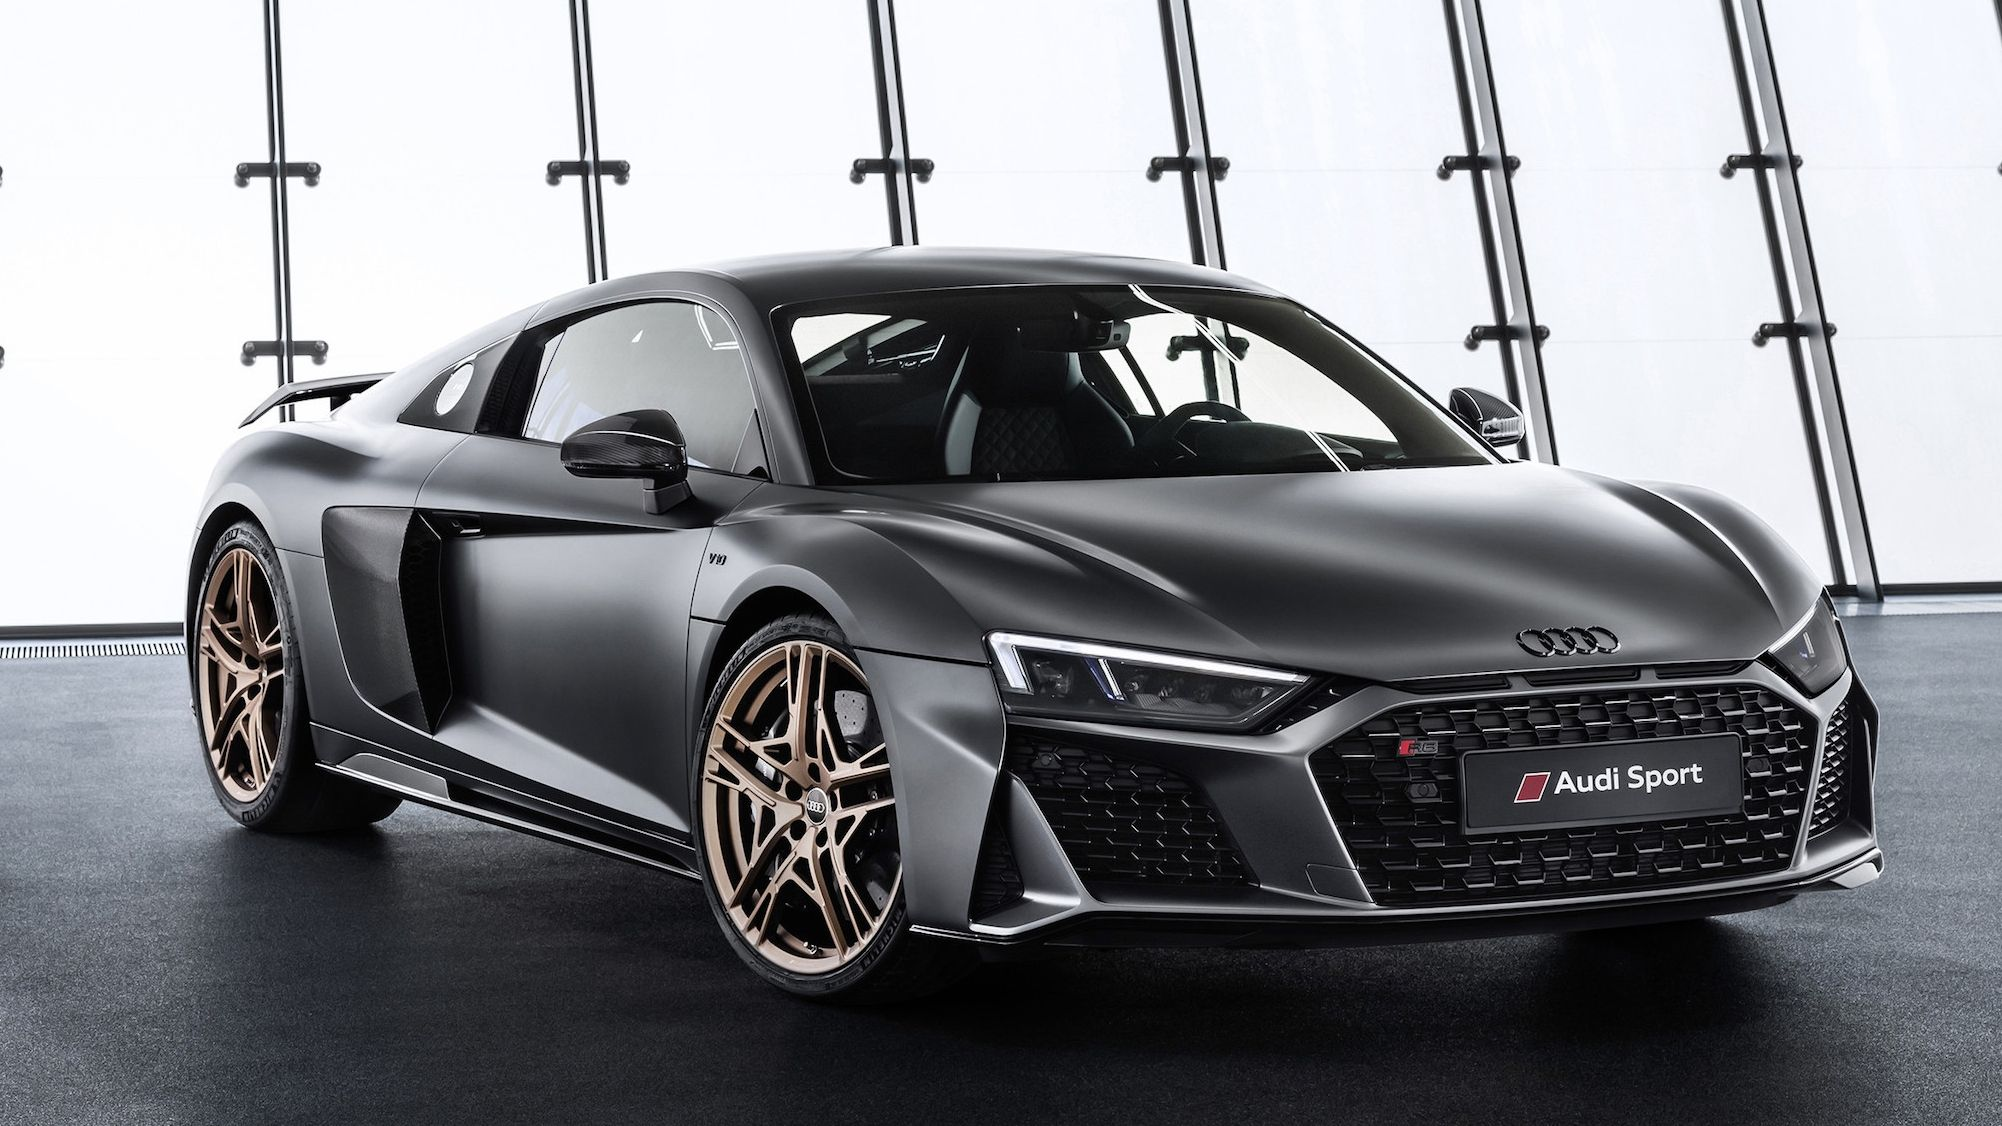 2020 Audi R8 V10 Decennium Top Speed Audi R8 Spyder Audi R8 V10 Plus Audi R8 V10